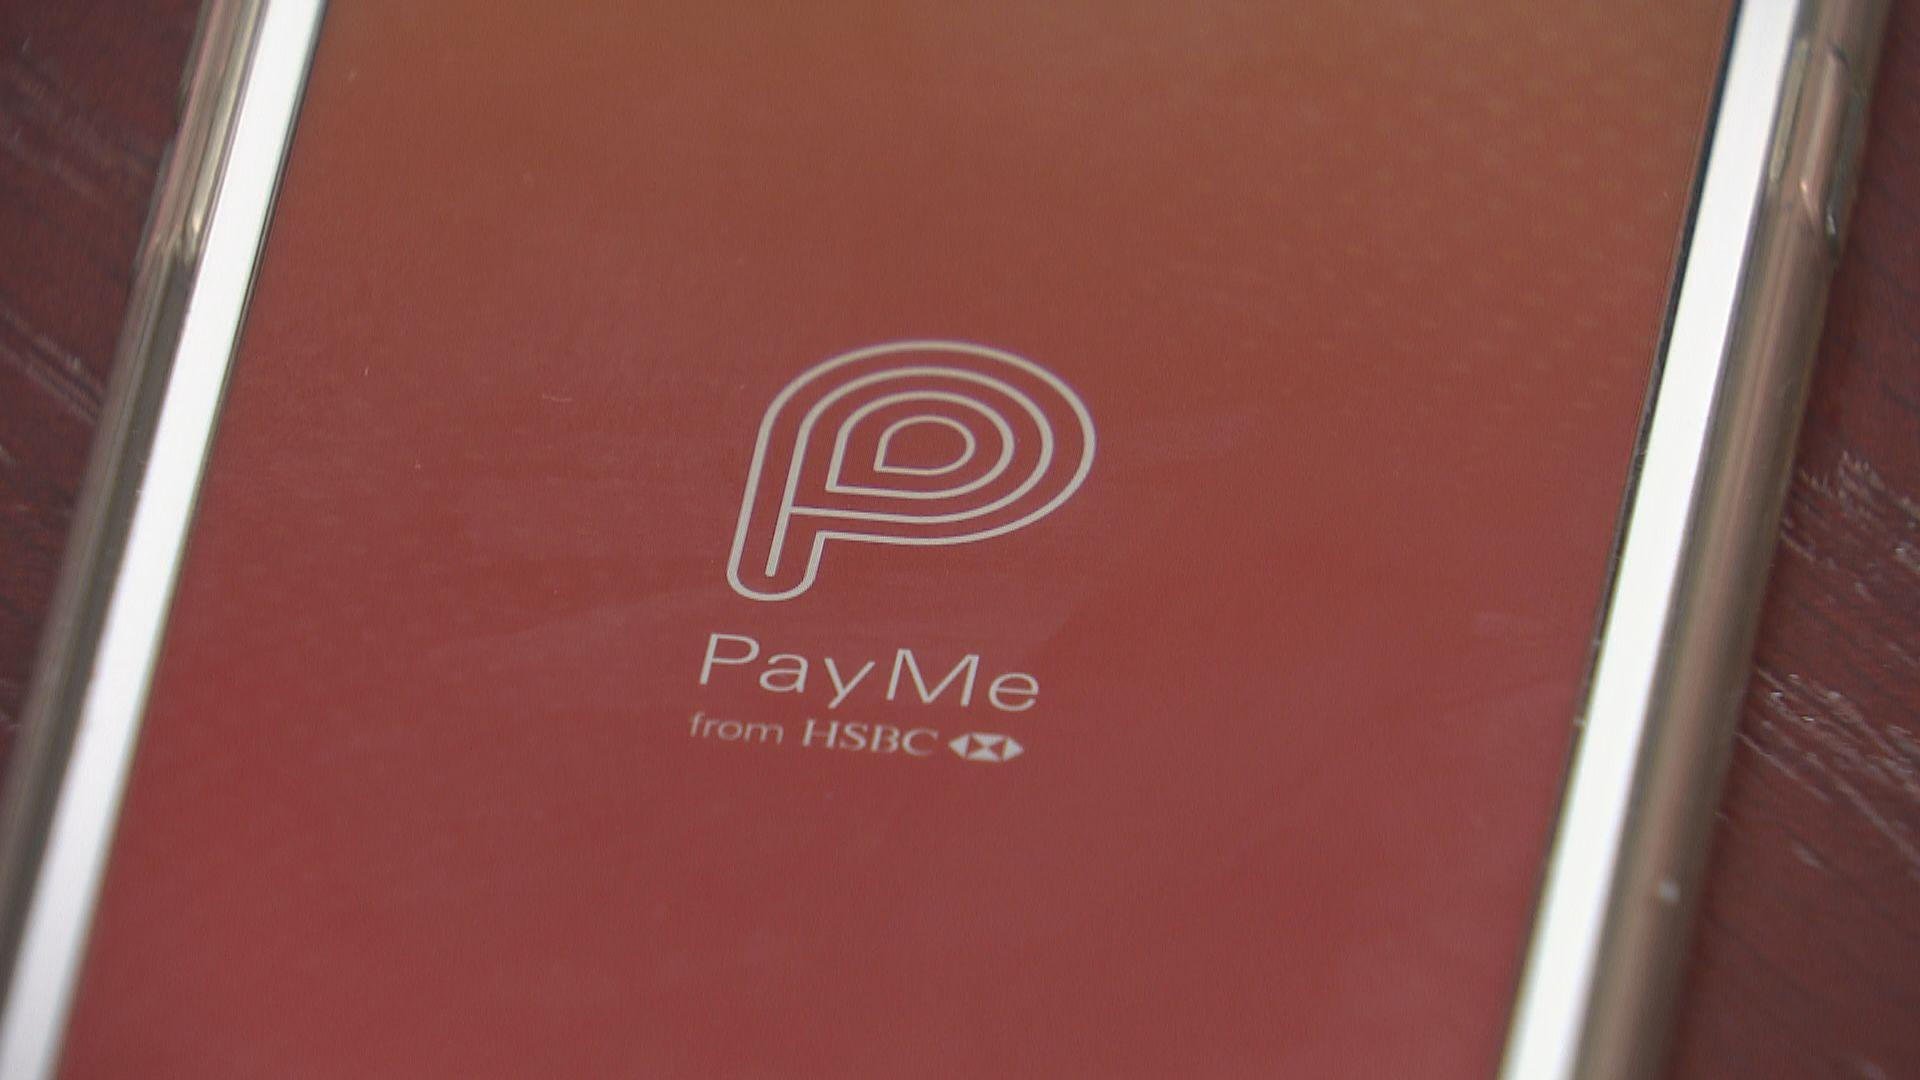 PayMe帳戶被盜用 有關損失將獲賠償